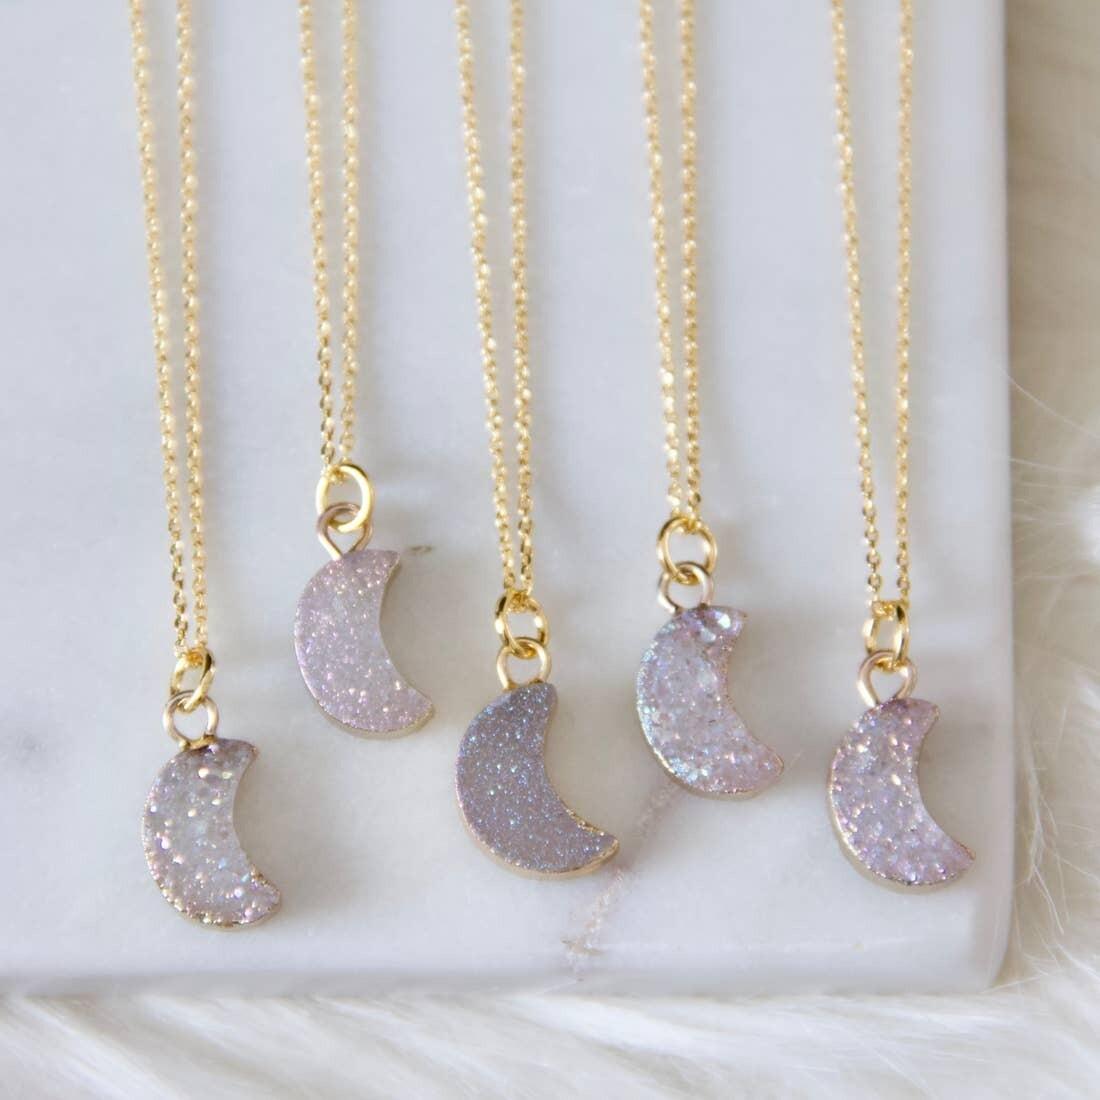 Tiny Moon Druzy Necklace 16 inches